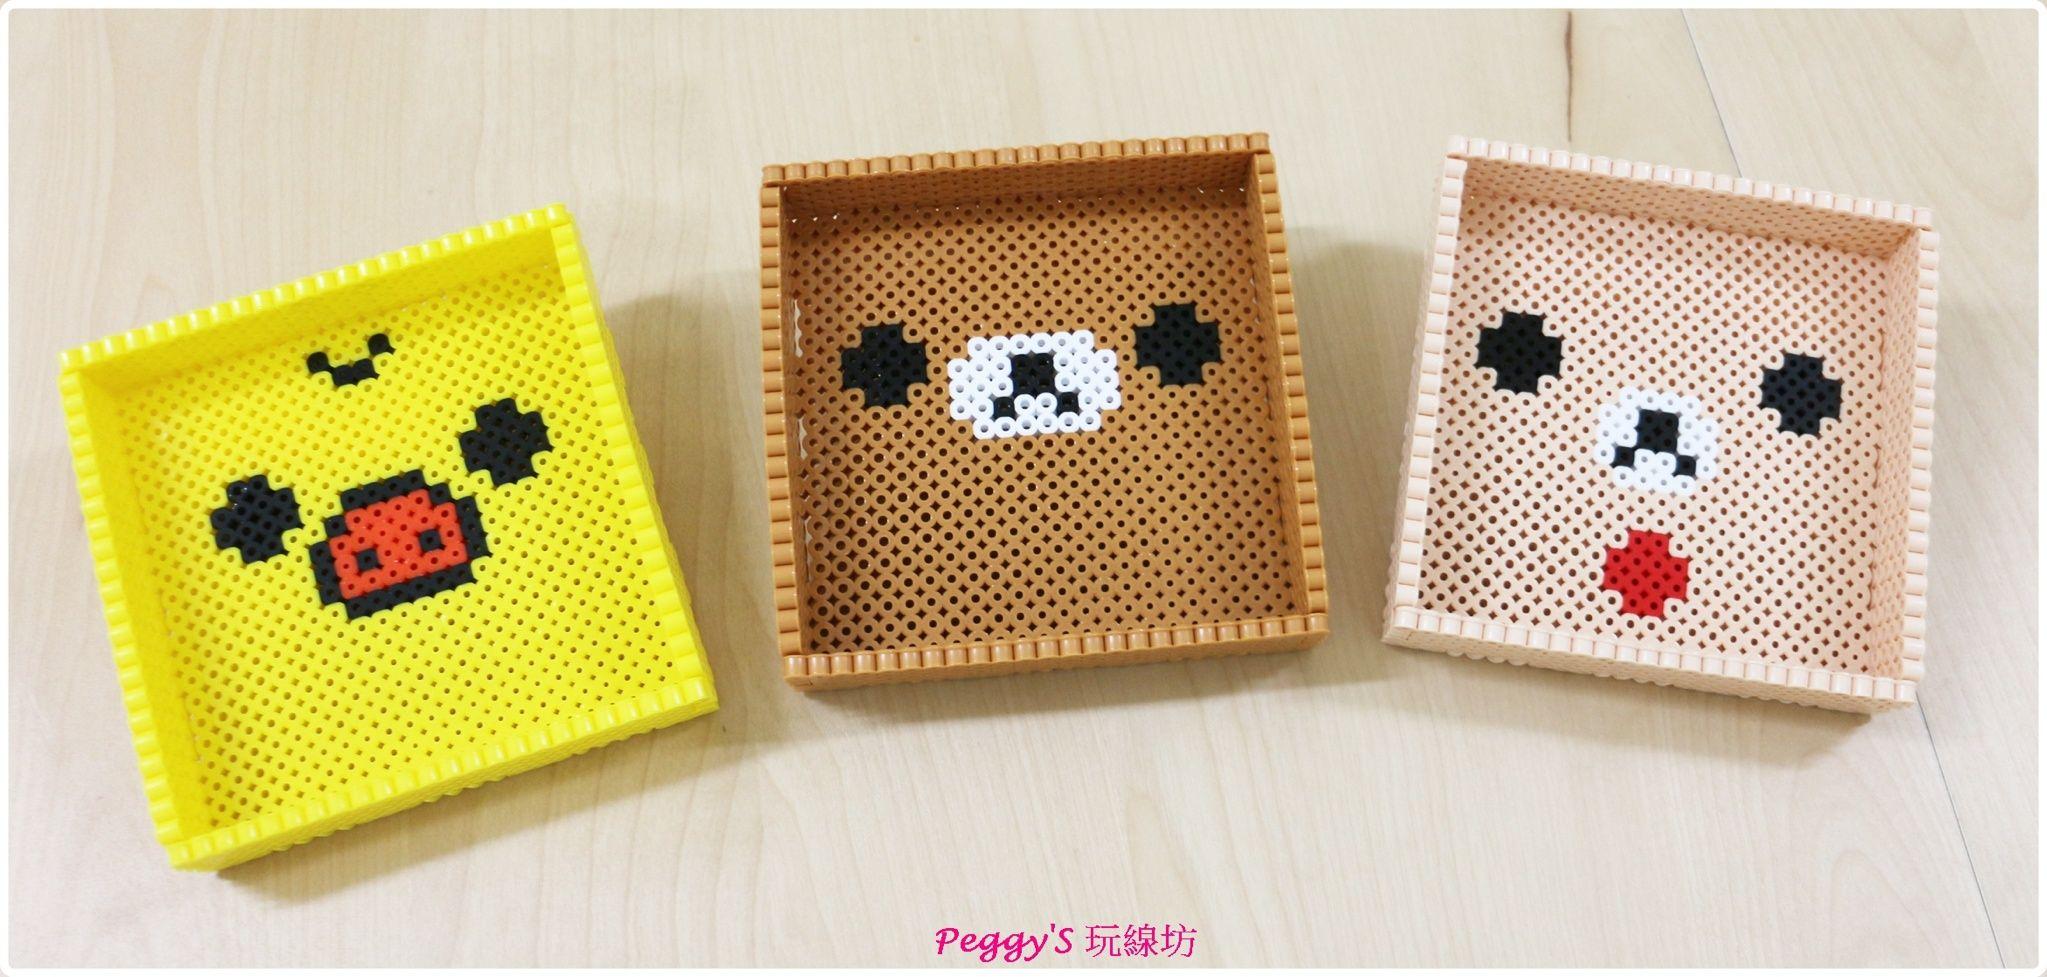 Peeler bead 3D box | Diy perler beads, Perler bead art, Perler beads designsPinterest